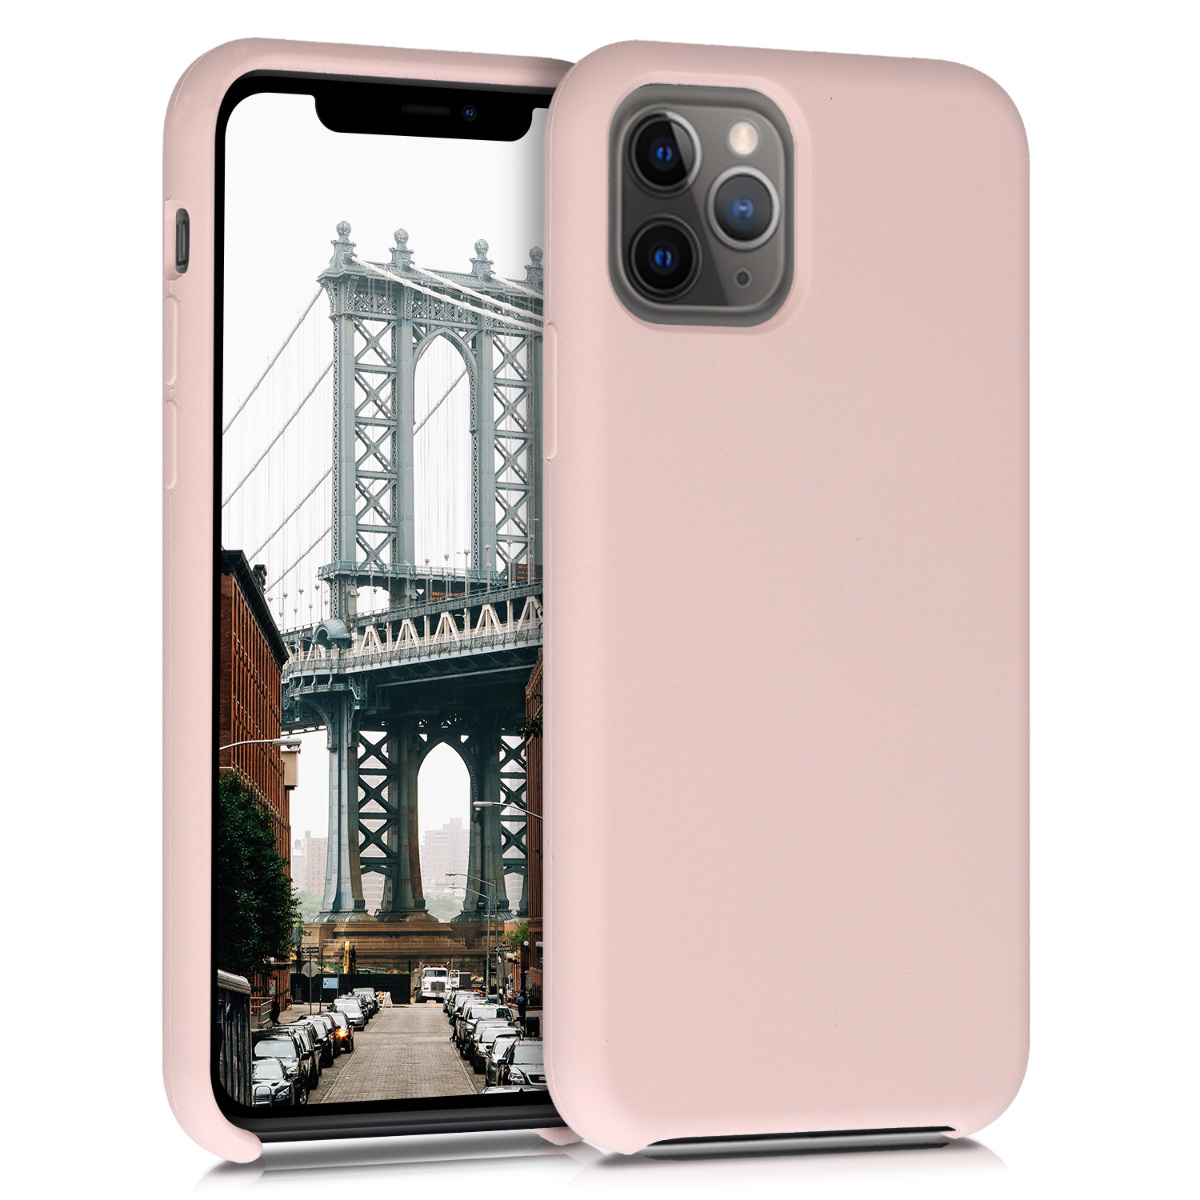 KW Θήκη Σιλικόνης Apple iPhone 11 Pro Max - Soft Flexible Rubber - Dusty Pink (49725.10)